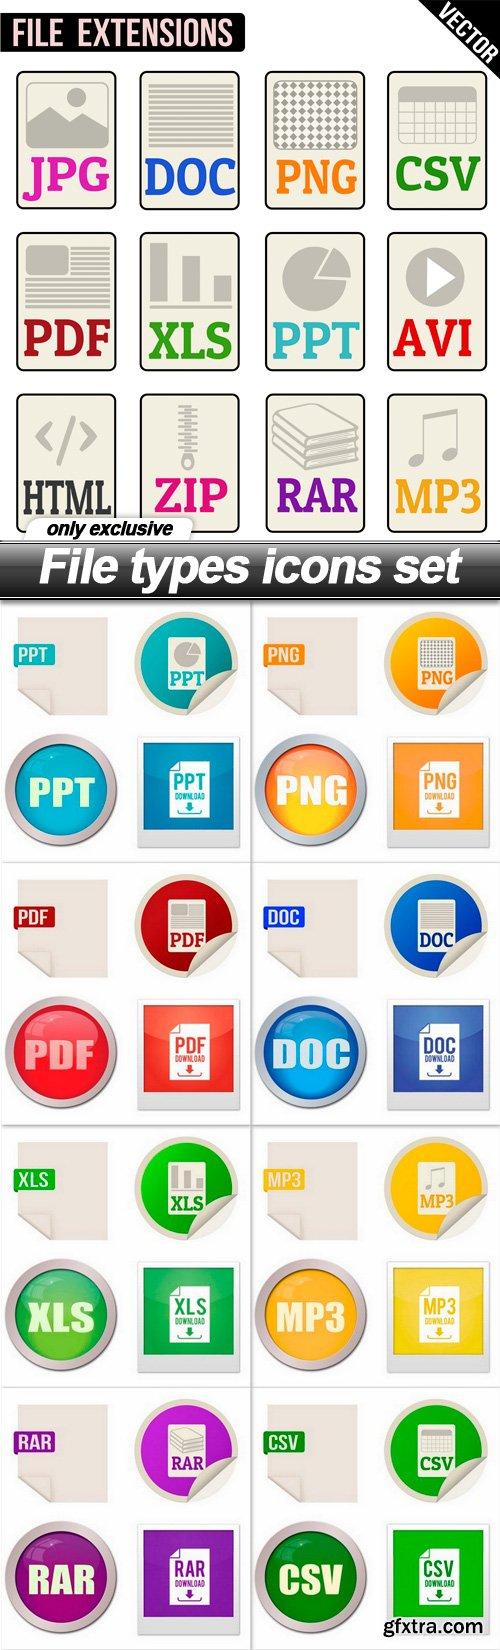 File types icons set - 9 EPS